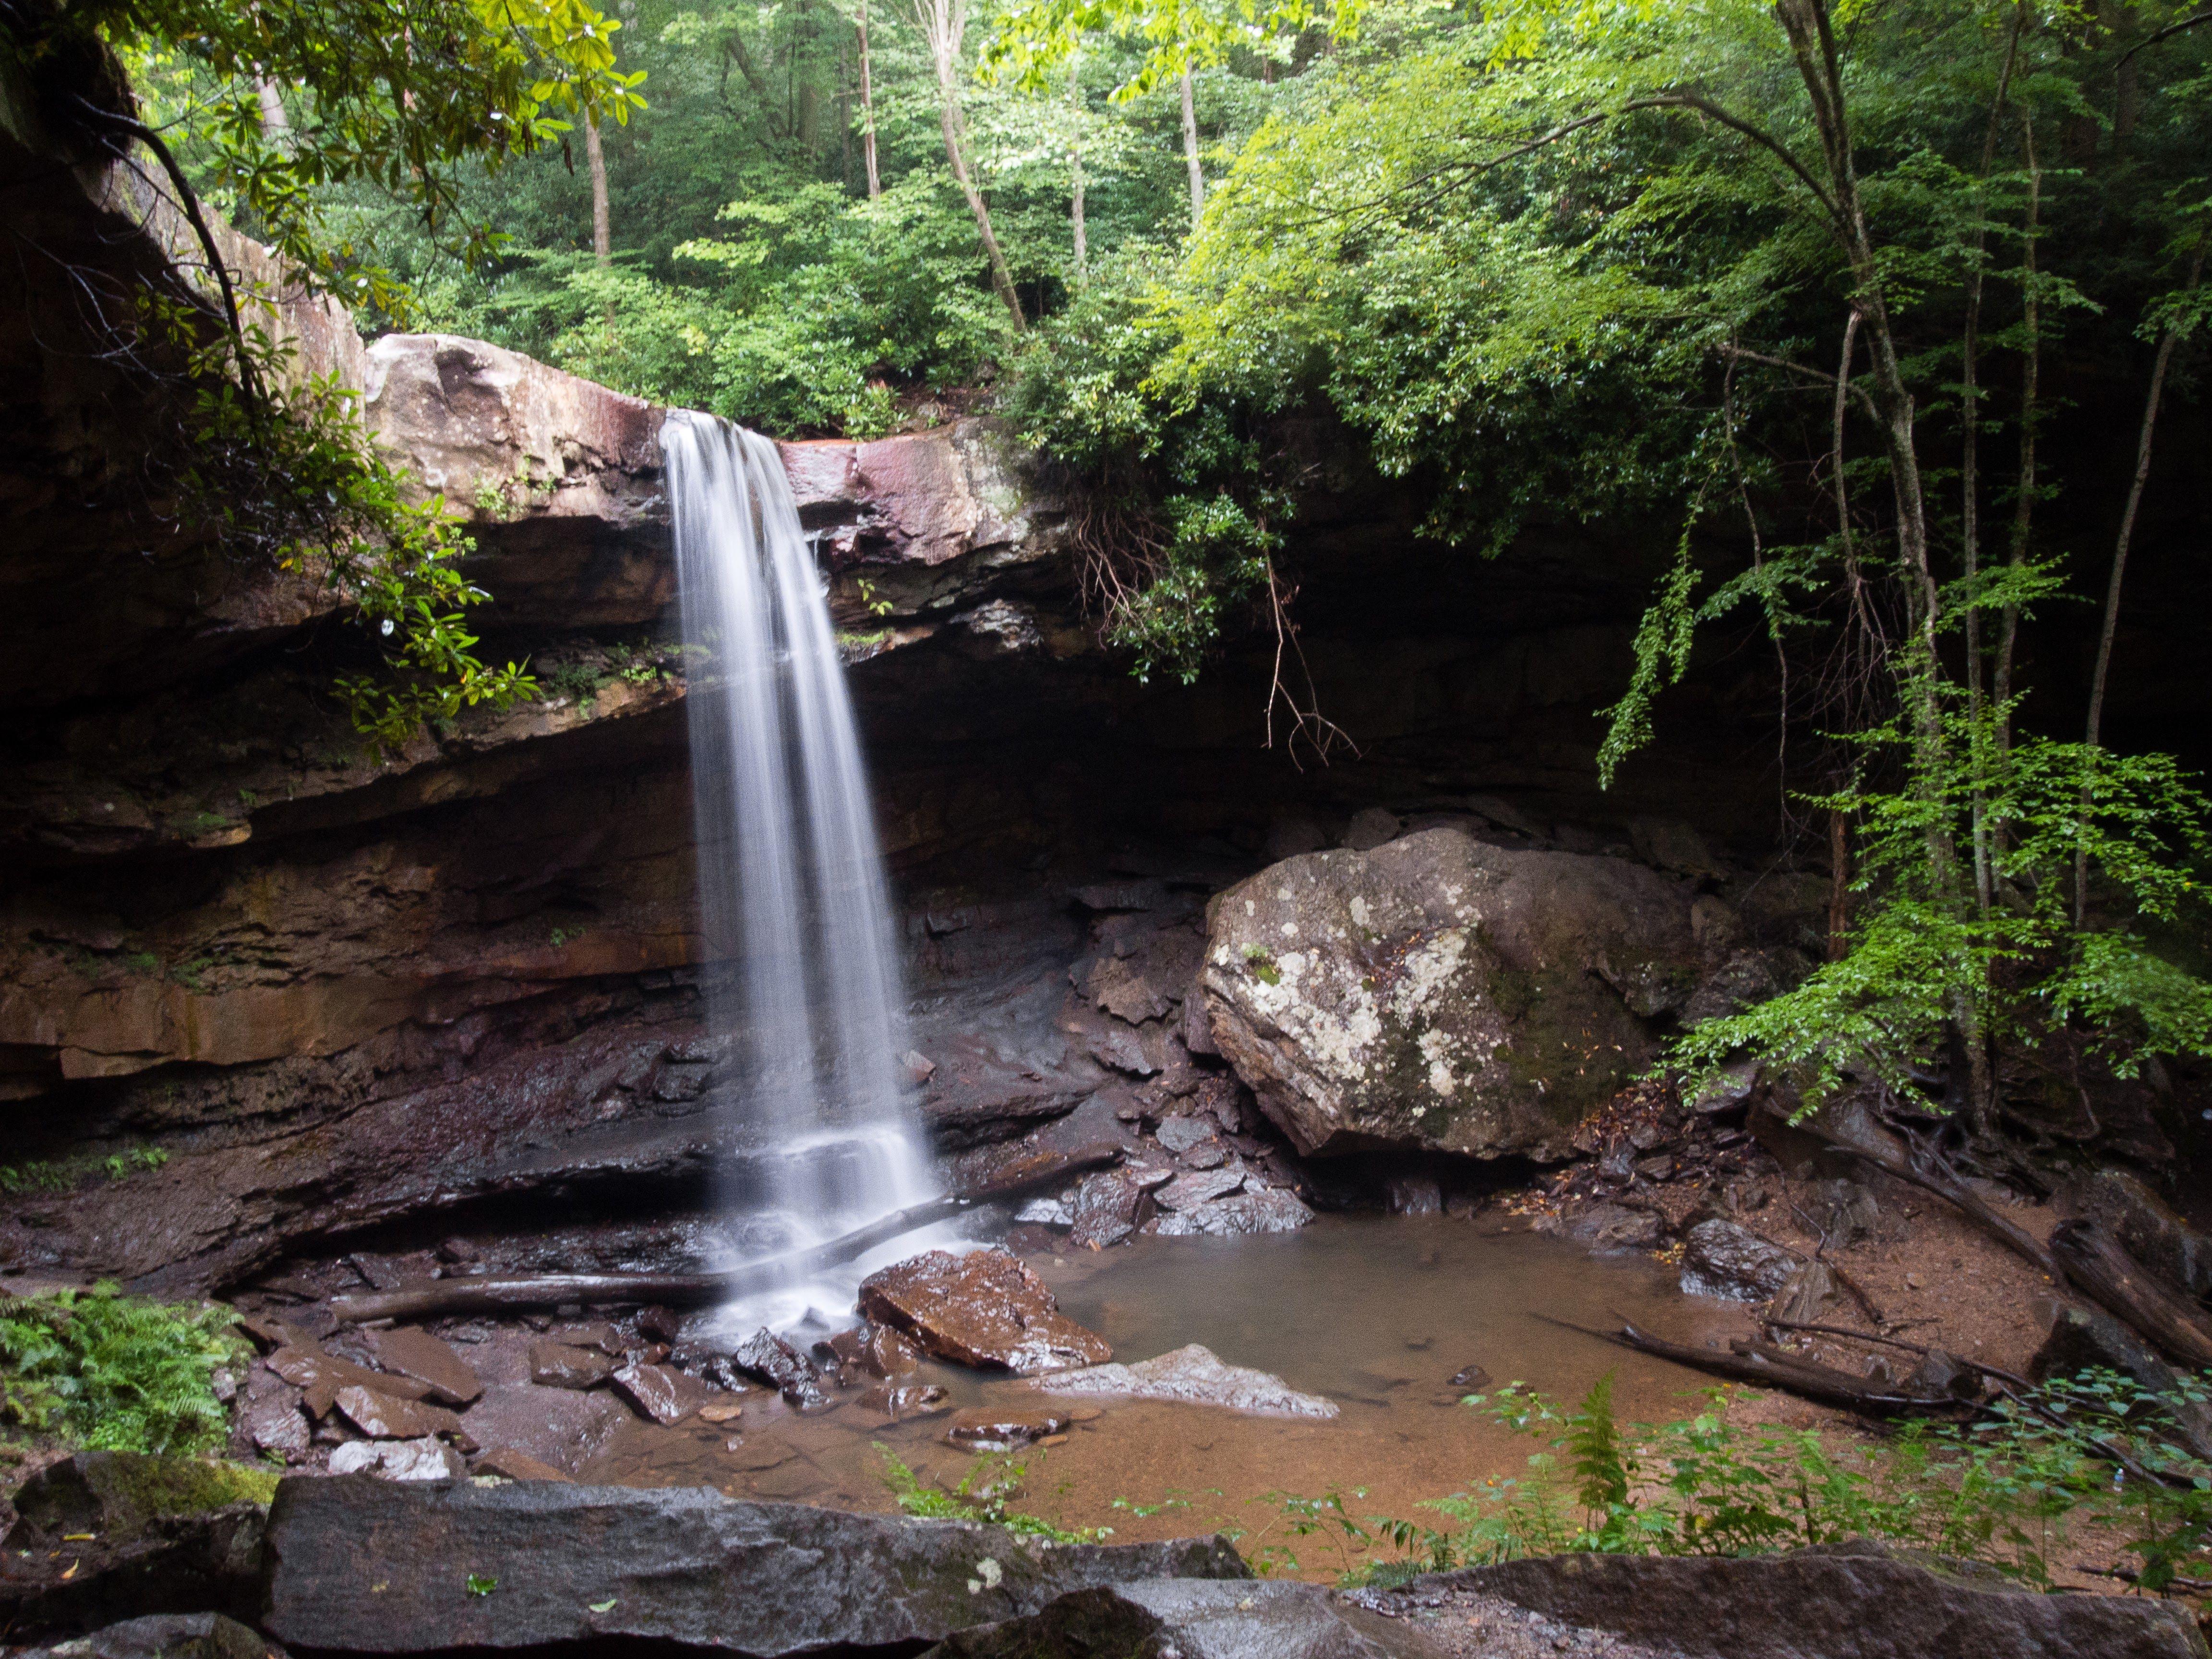 cucumber falls at ohiopyle state park #waterfall #nature